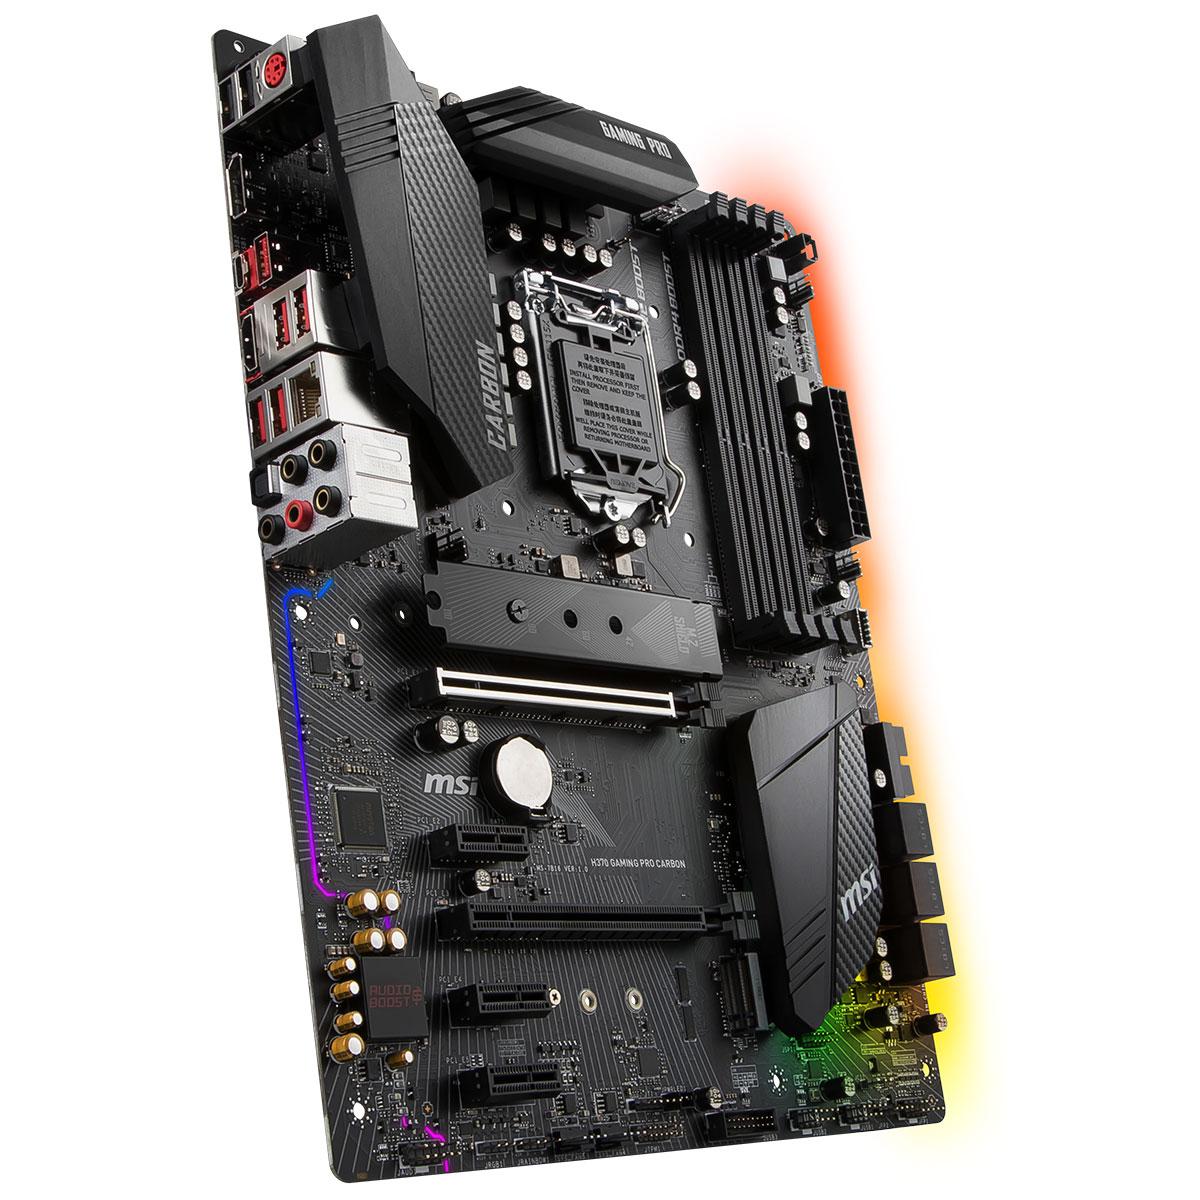 MSI H370 GAMING PRO CARBON ATX DDR4 - Carte mère MSI - Cybertek.fr - 3